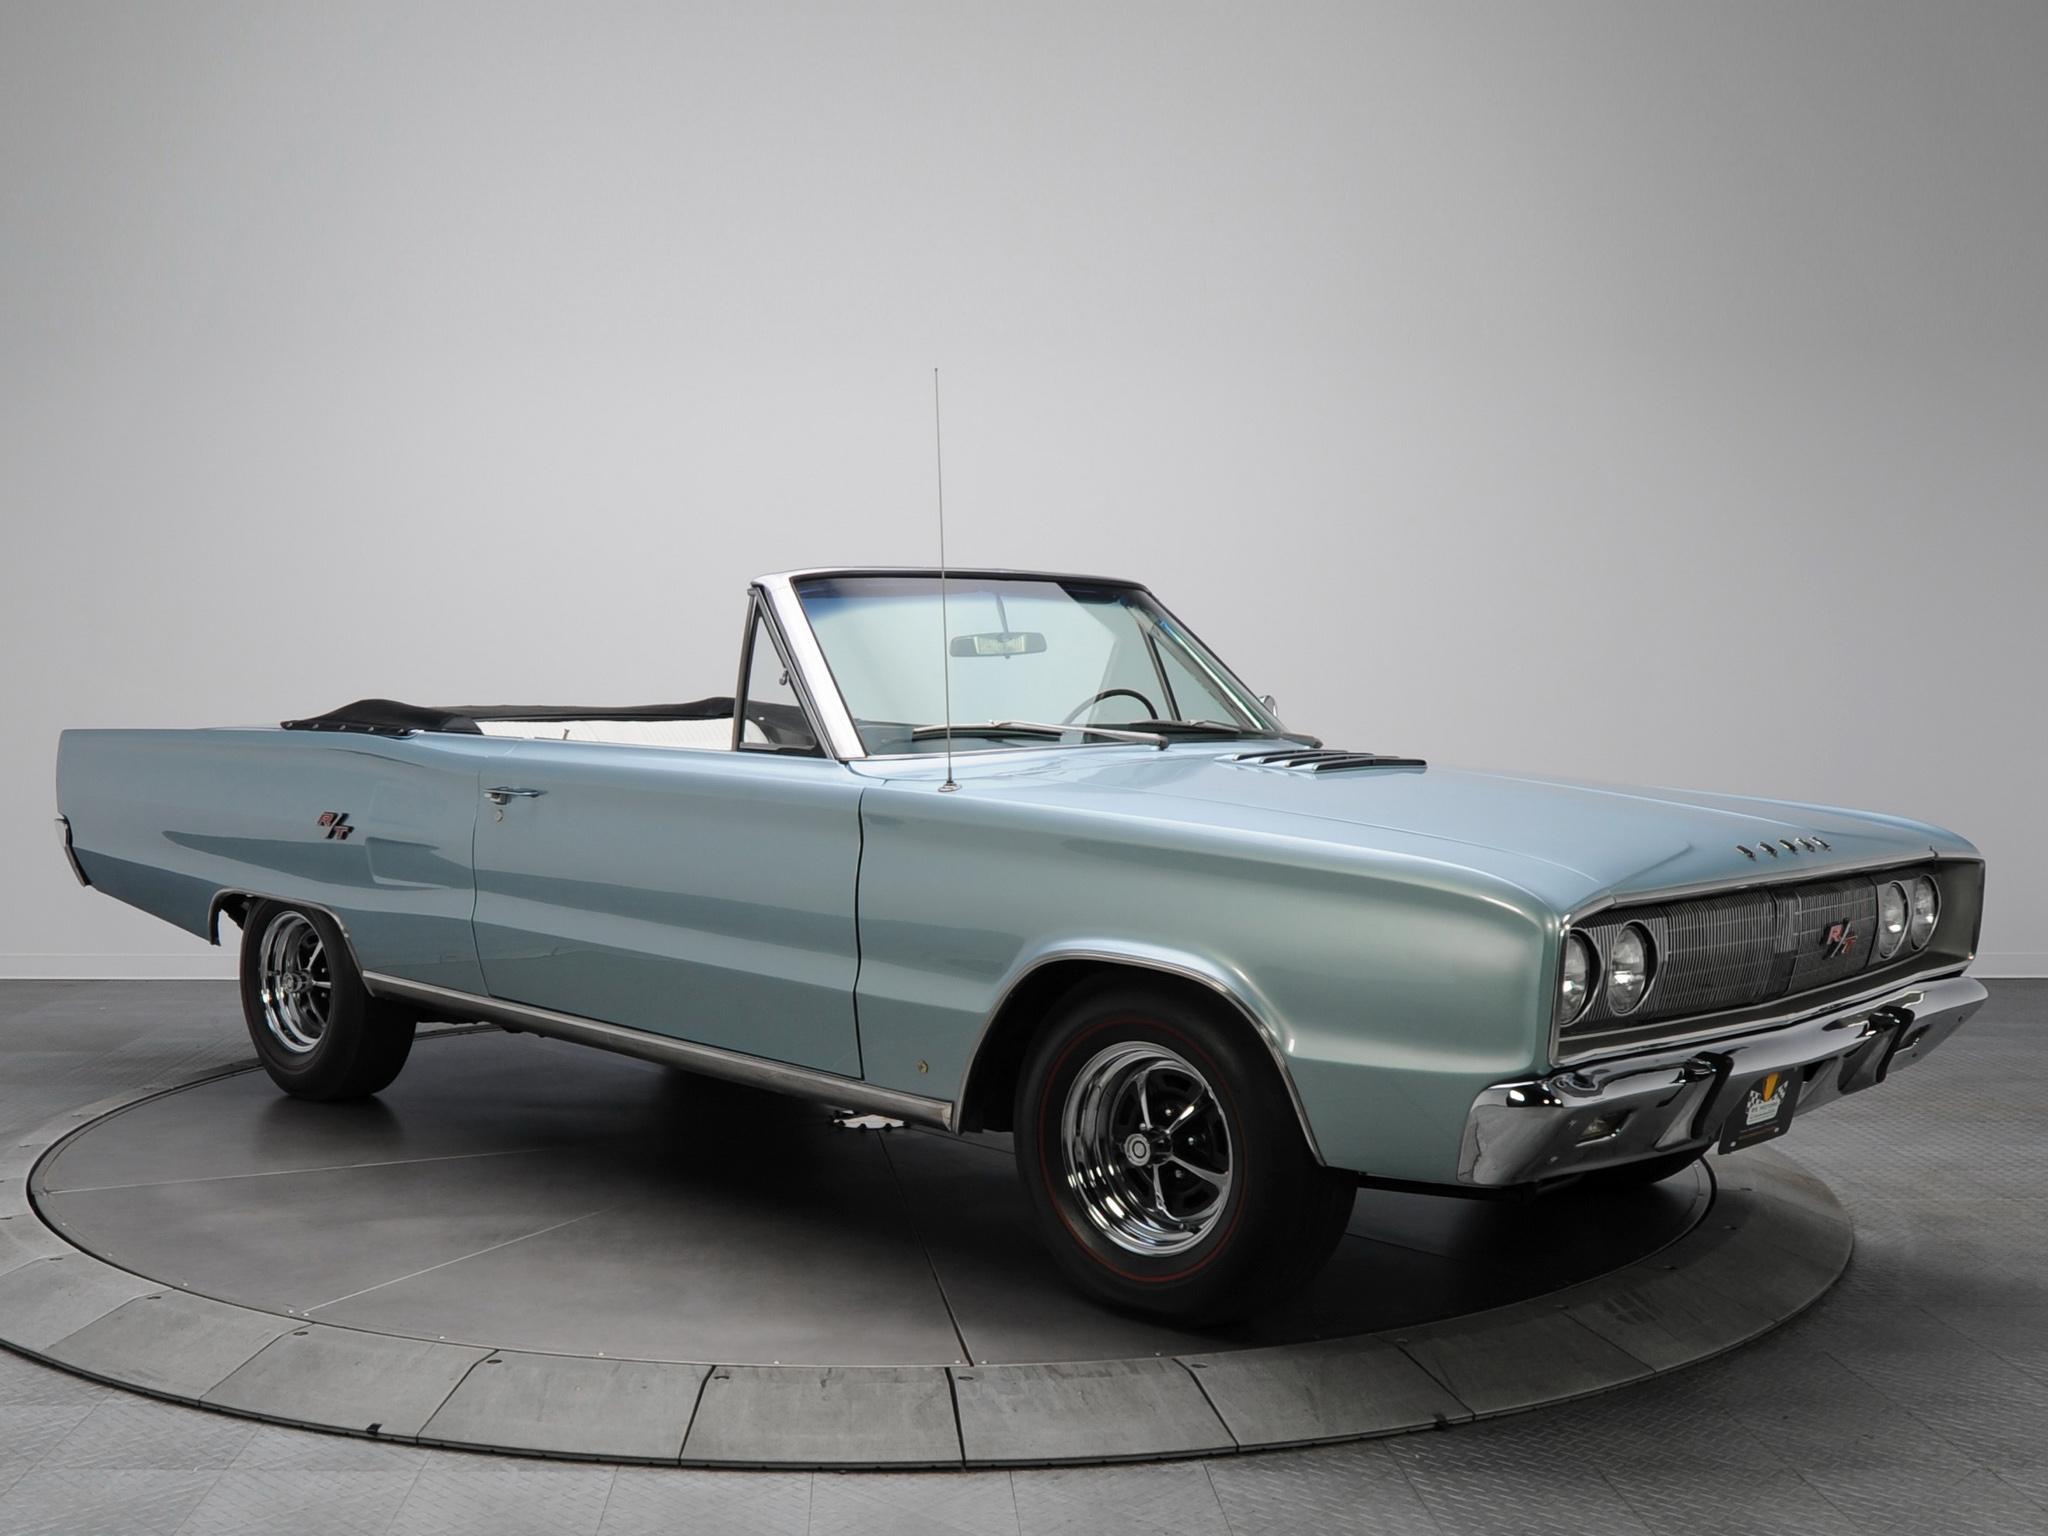 1967 dodge coronet r t convertible ws27 muscle classic h wallpaper 2048x1536 116772 wallpaperup